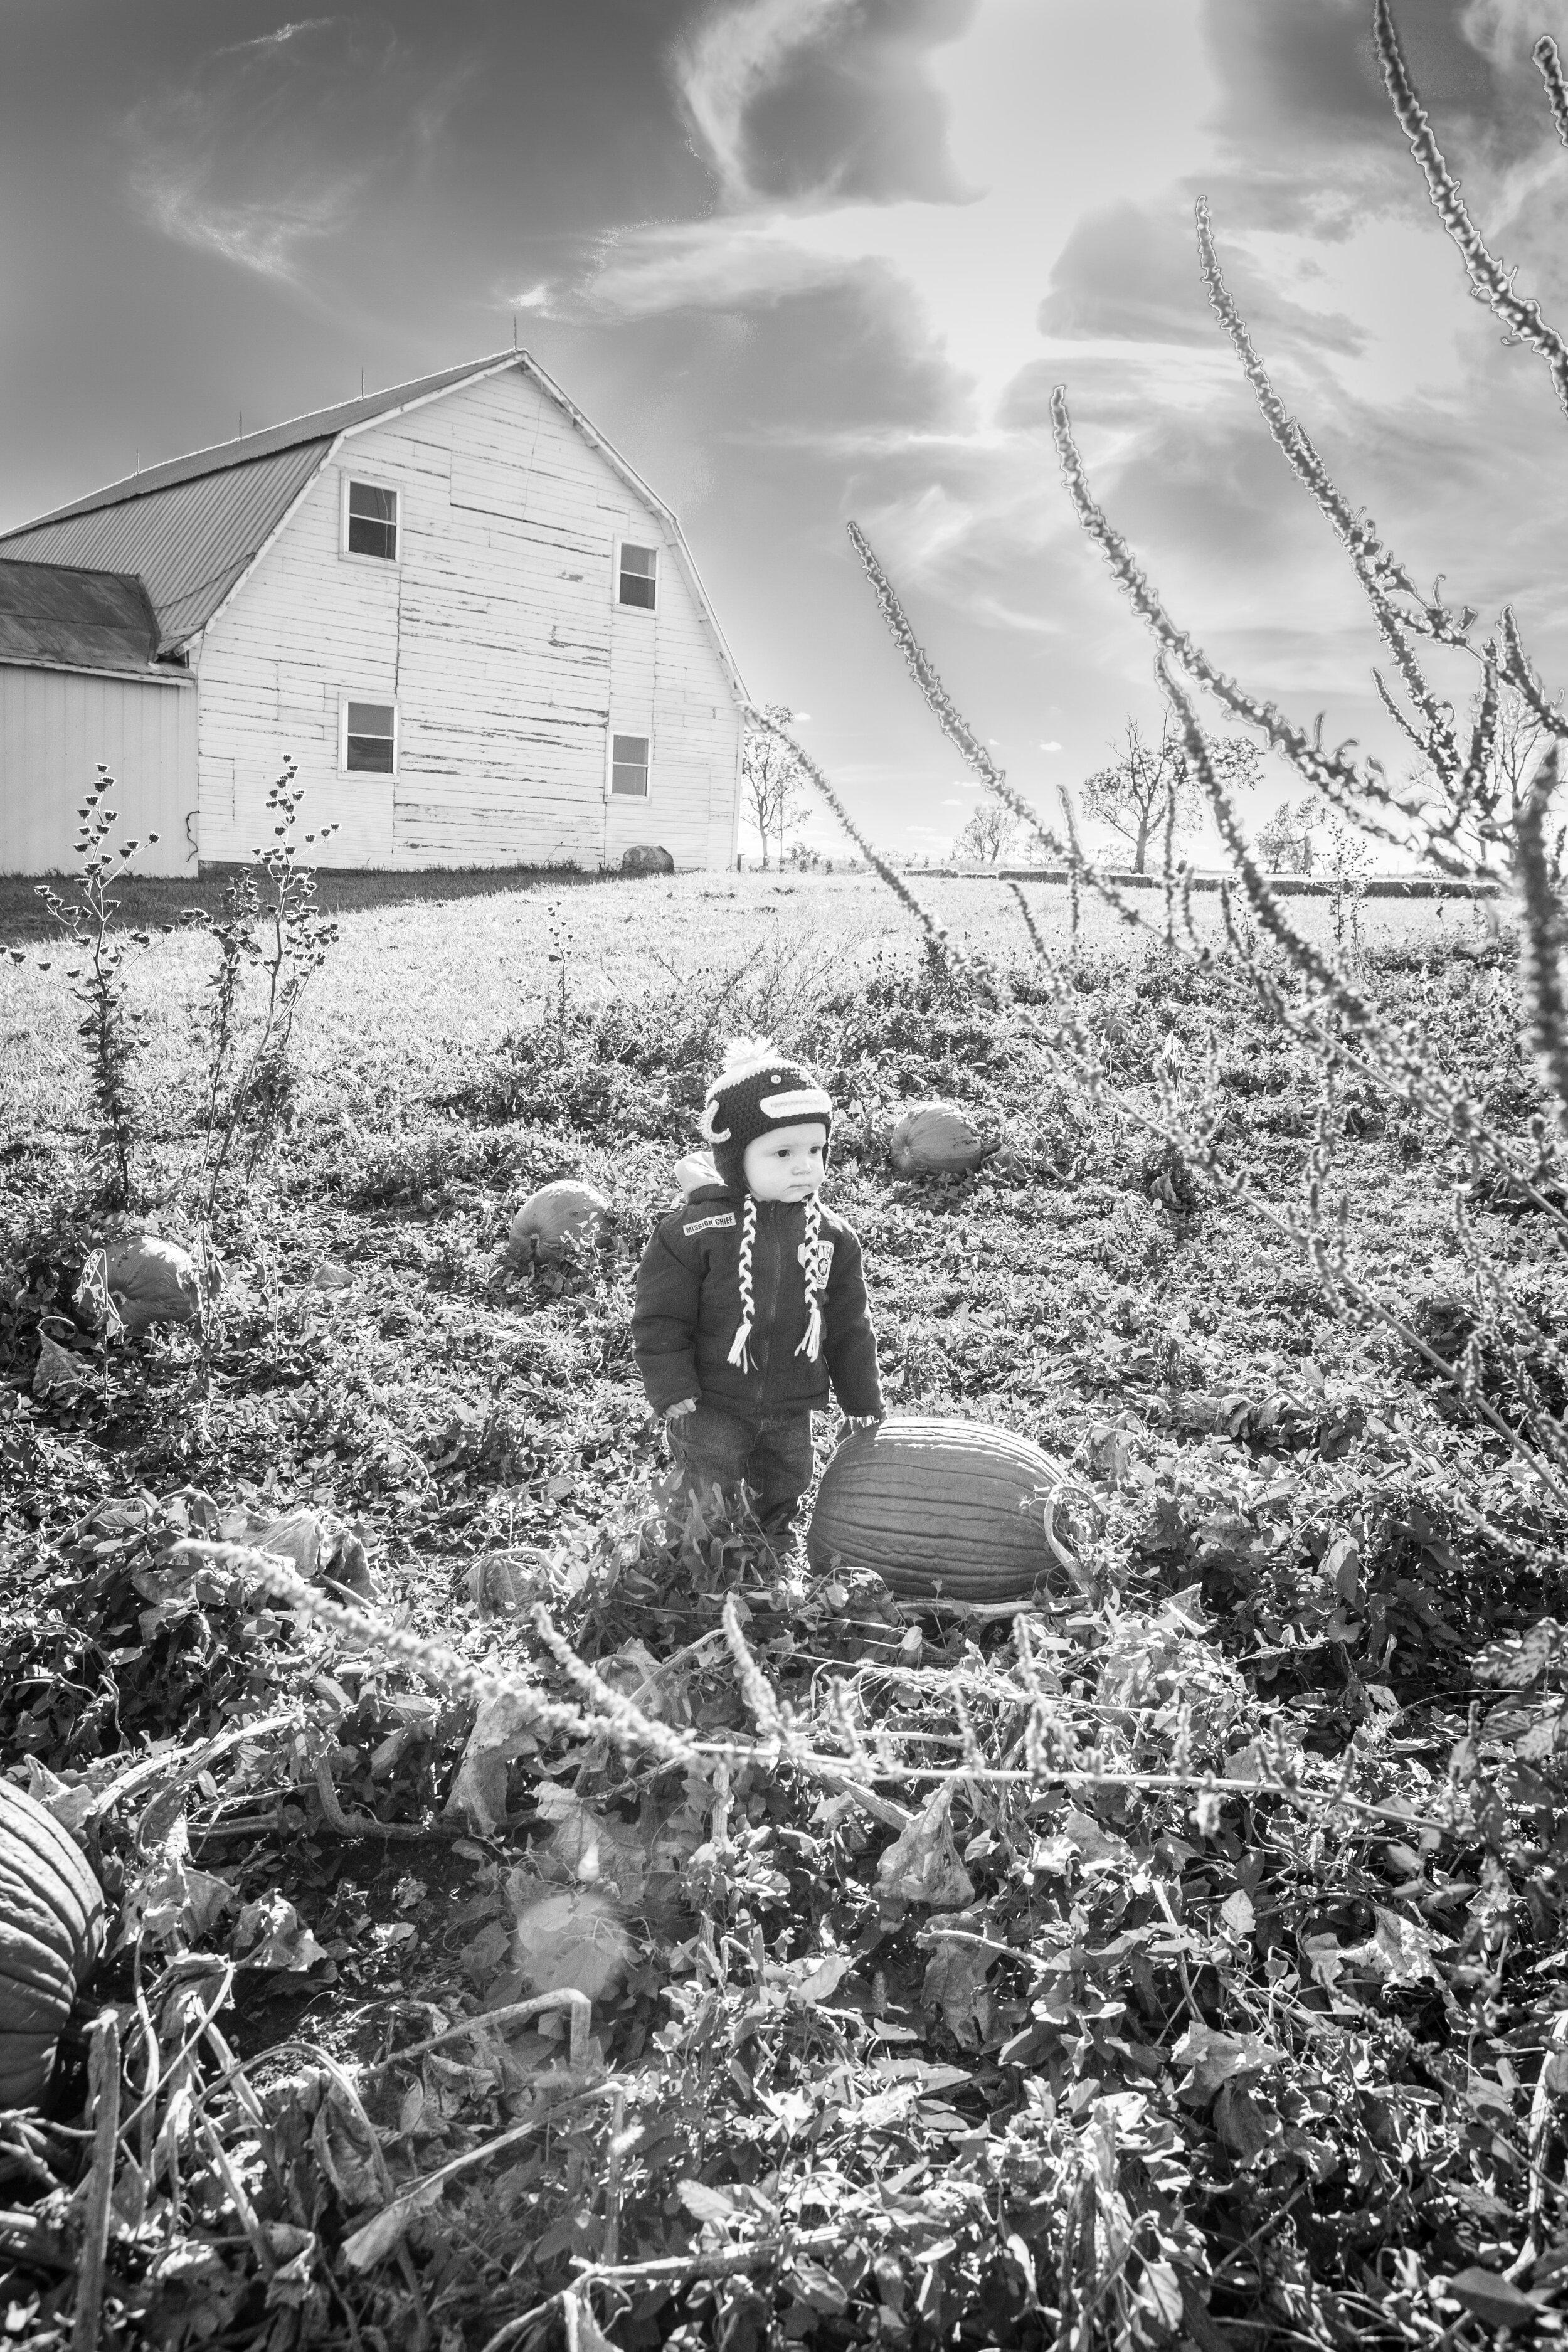 farm-toddler-fall-pumpkin-patch-little-boy- Photography by Ranae Keane.jpg